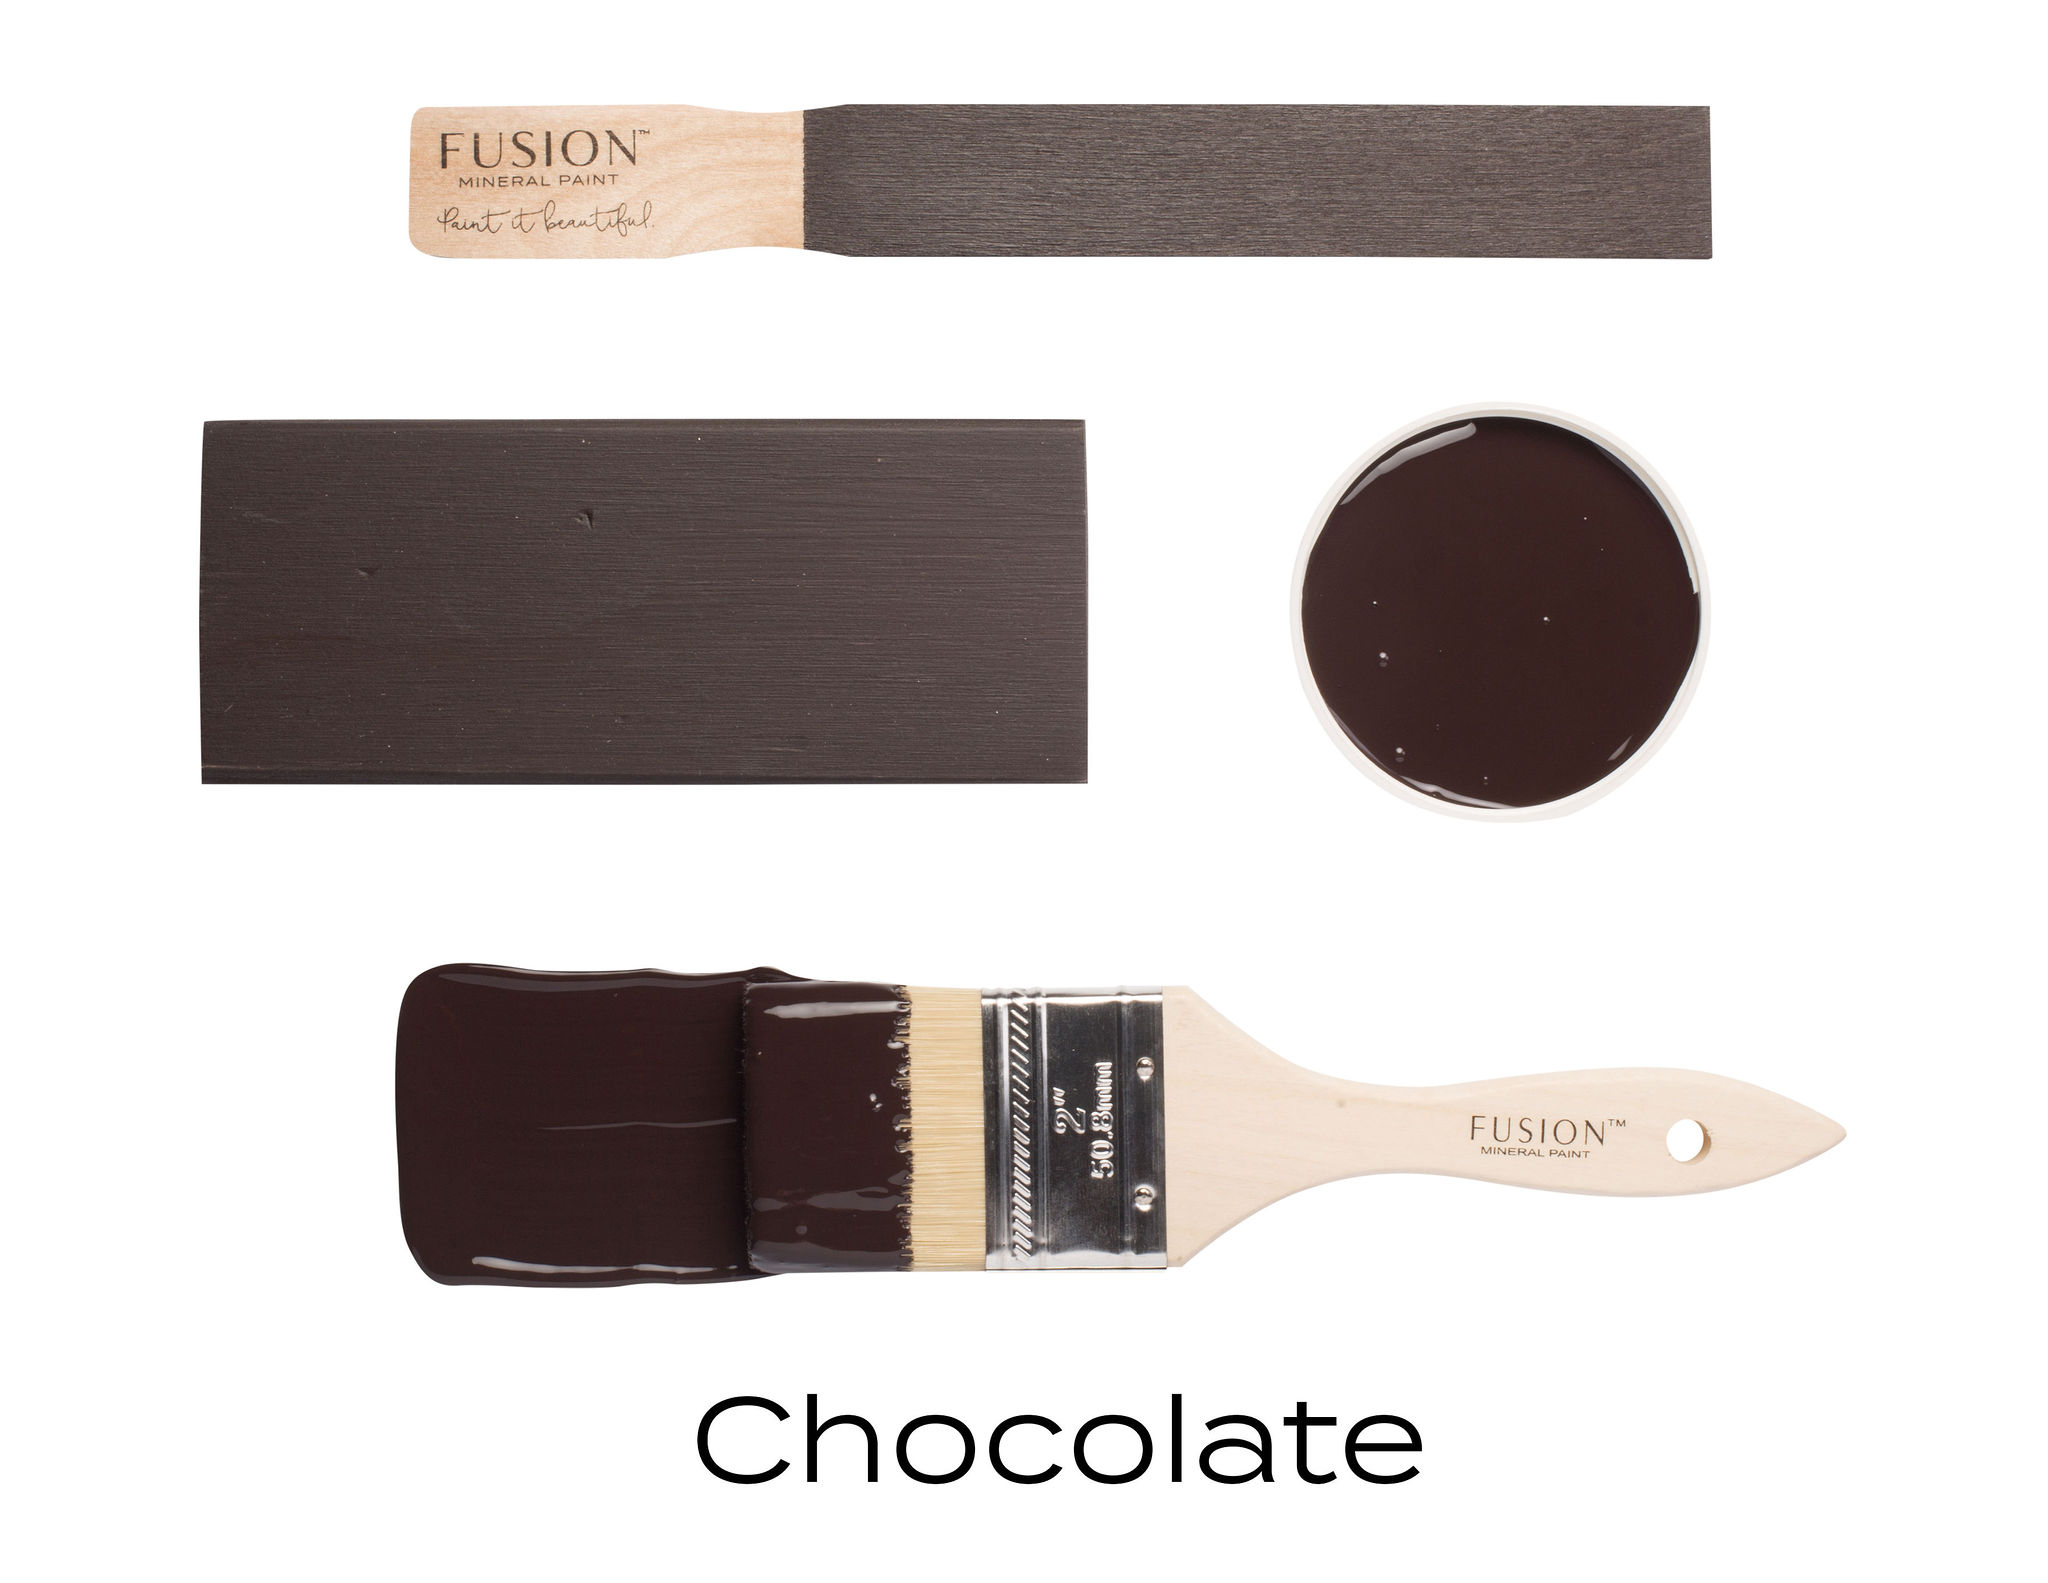 Chocolade, Fusion 500 ml